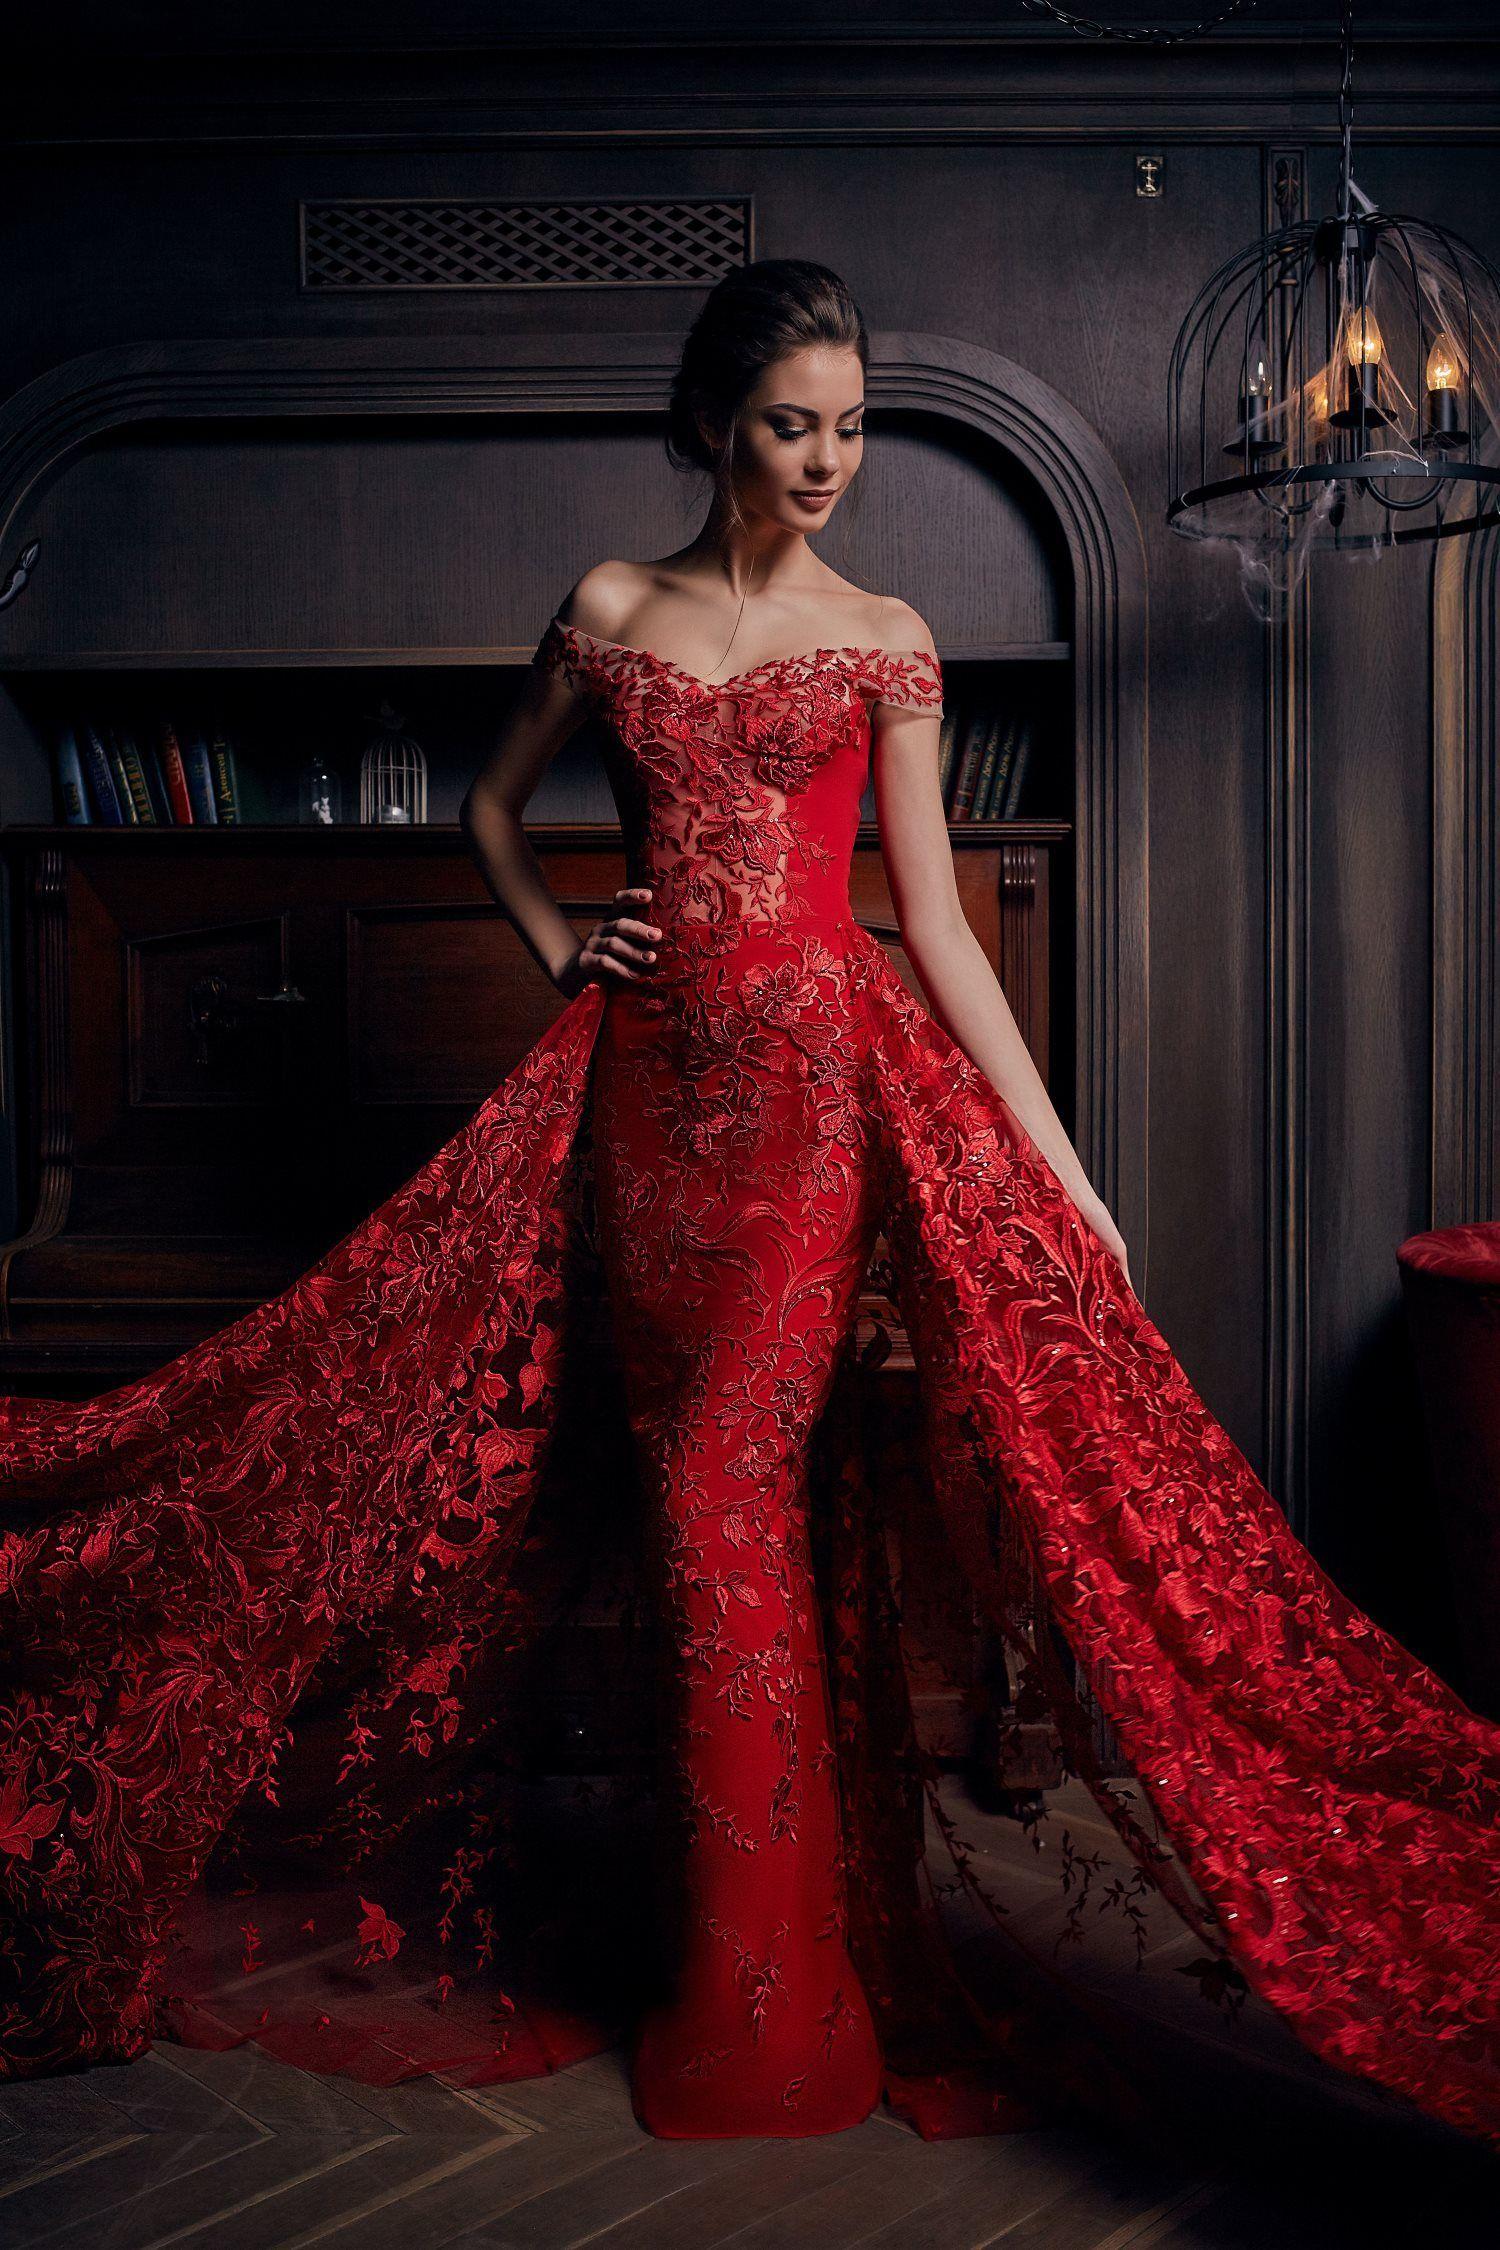 Robe de luxe #xmxlinx  Mermaid prom dresses, Formal evening